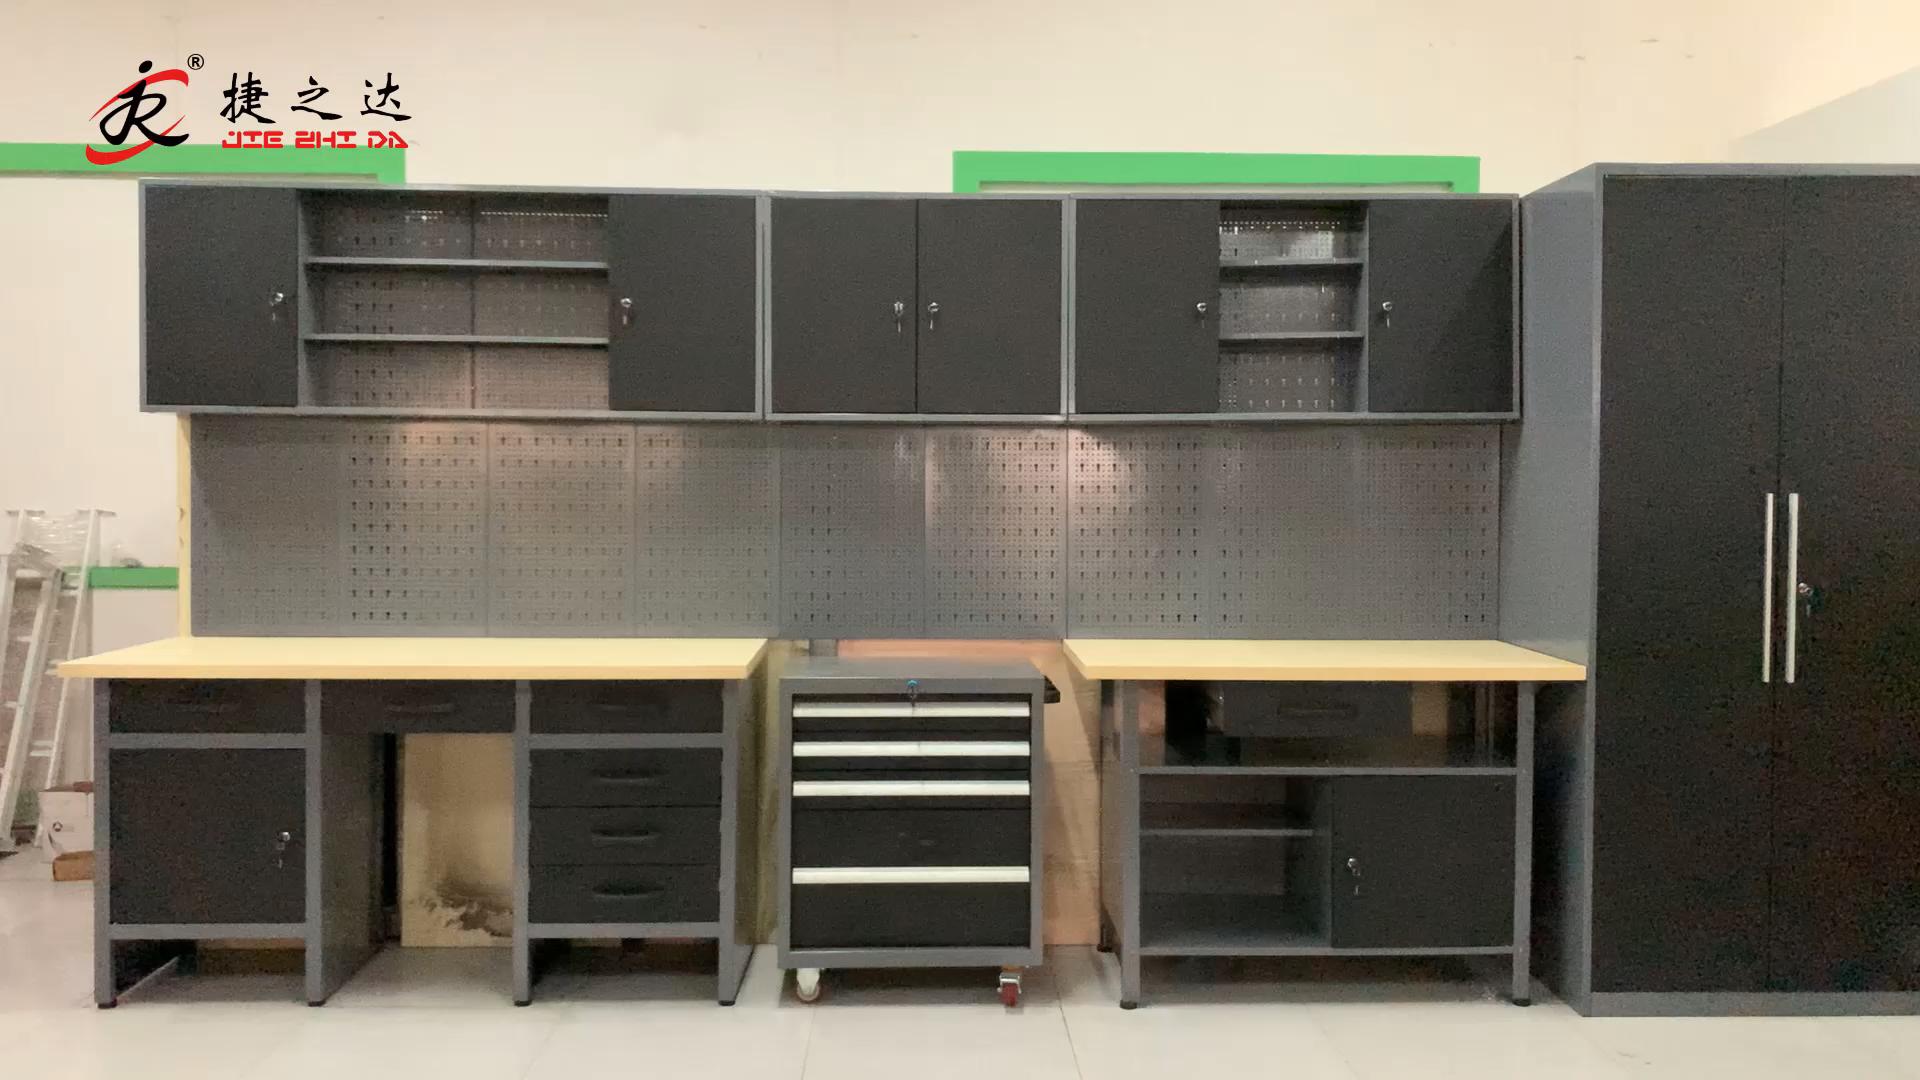 New Design 호주 핫 잘 팔리는 걸 이식 벽 tool 캐비닛 강 워크 벤치로 metal 캐비닛/garage storage tool 상자 대 한 workshop